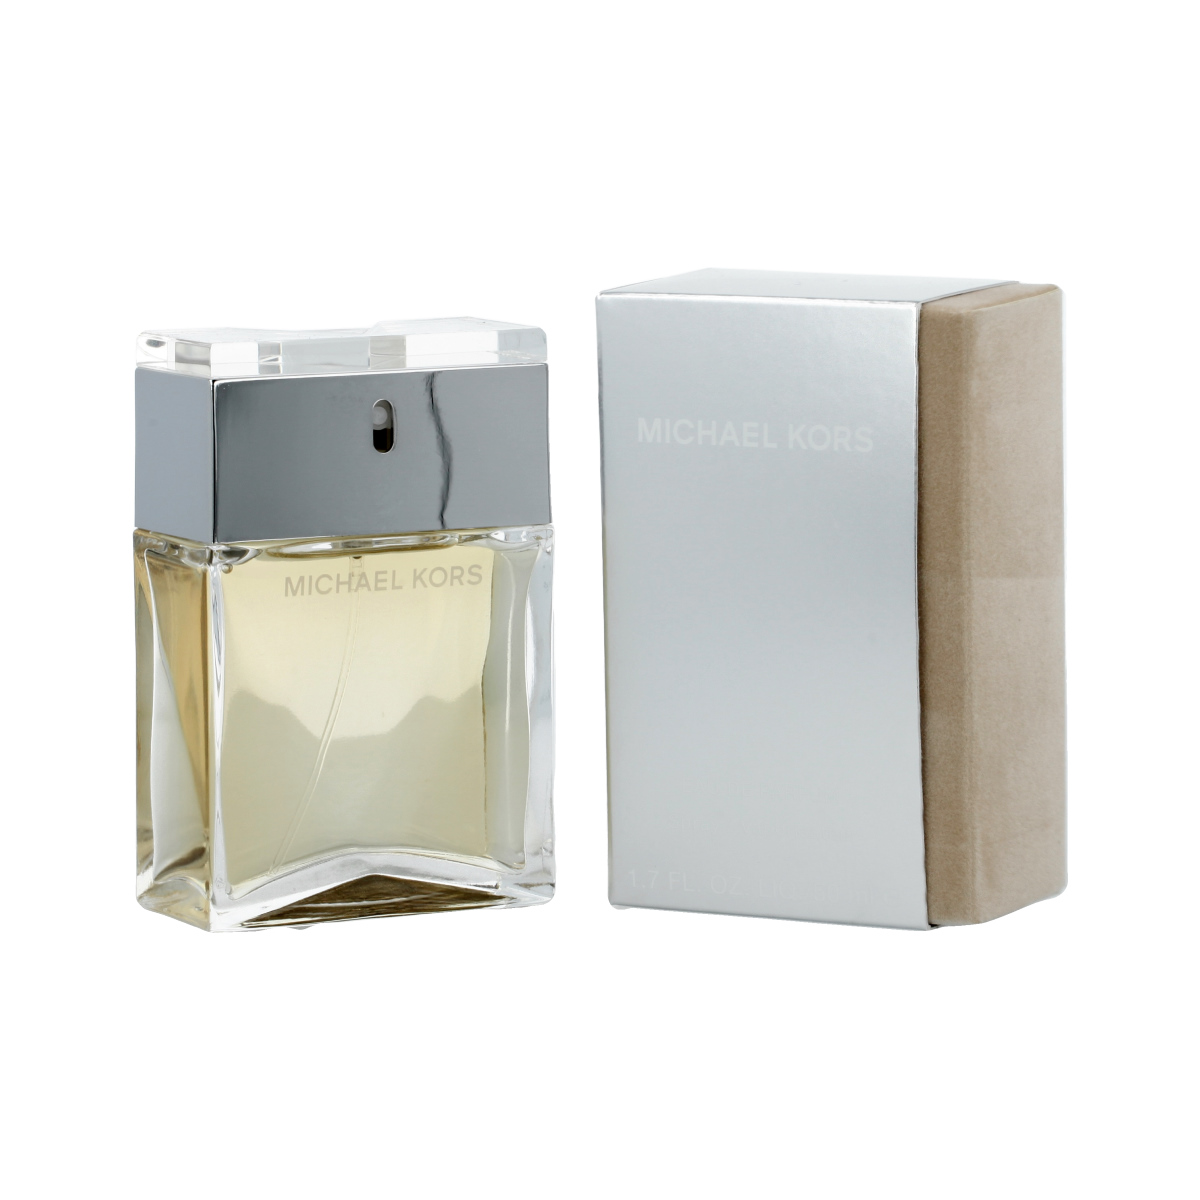 Michael Kors Michael Kors Eau De Parfum 50 ml (woman) 54265